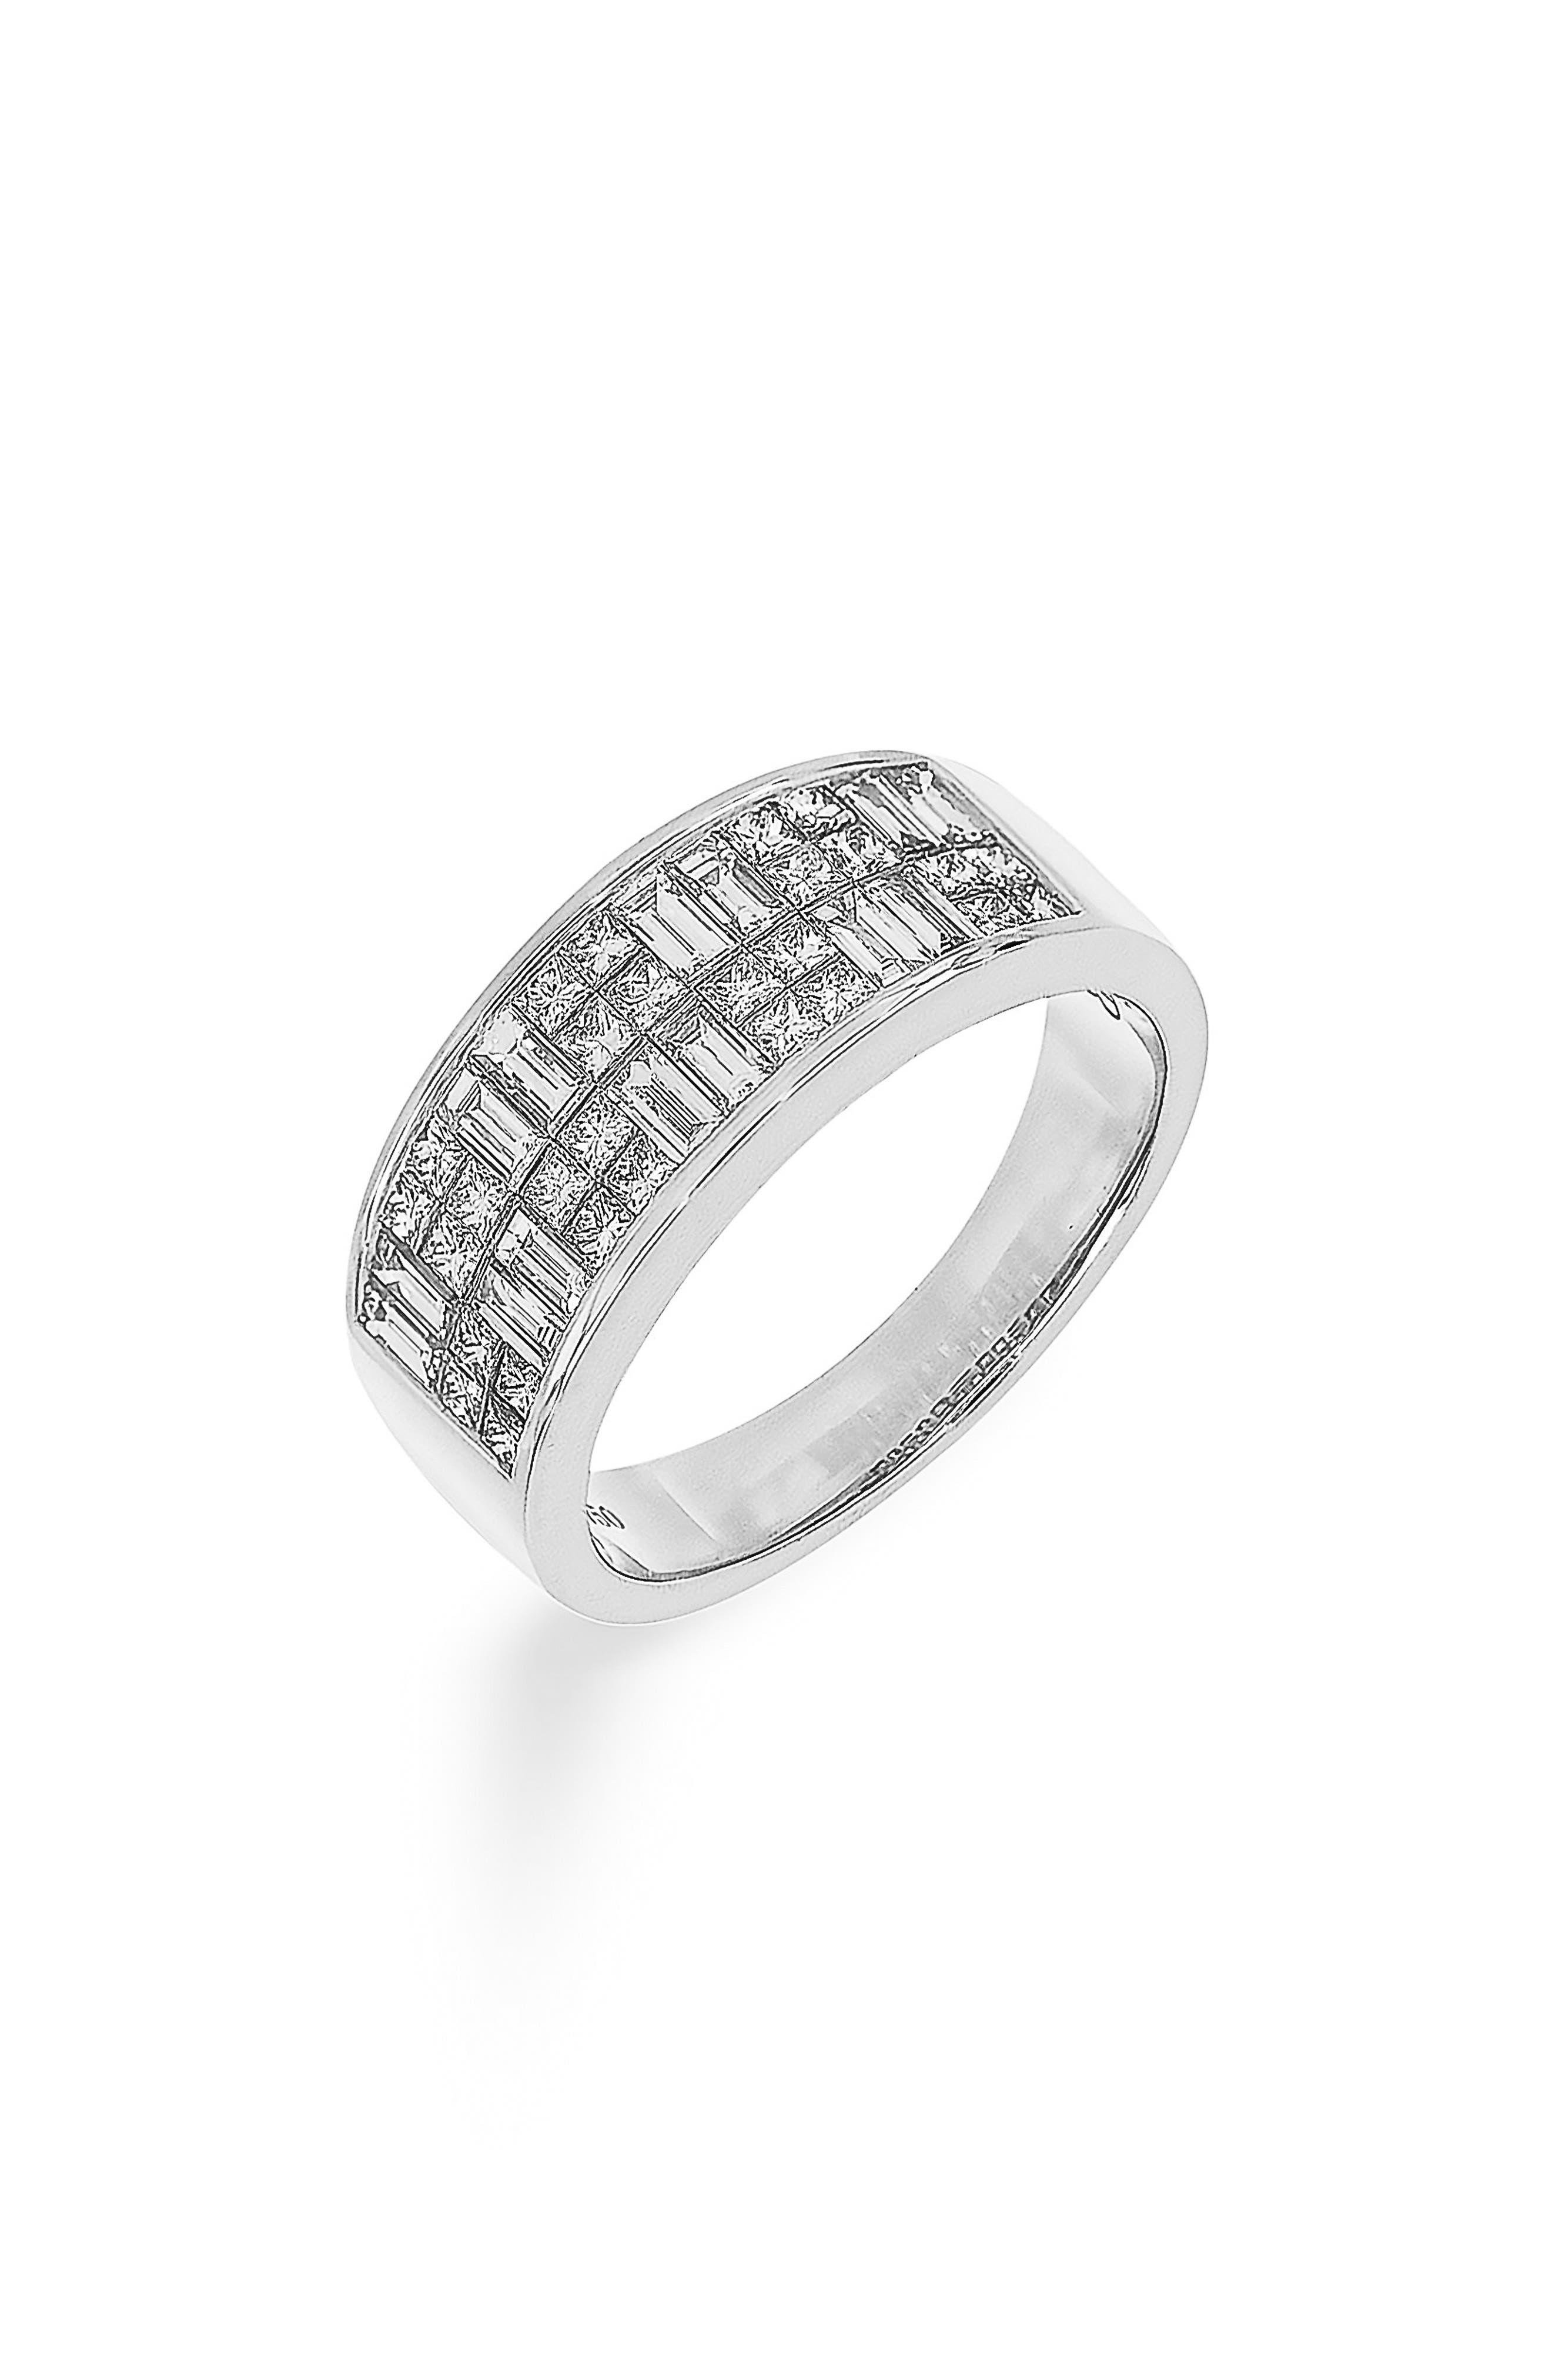 Mixed Shape Diamond Ring,                             Main thumbnail 1, color,                             WHITE GOLD